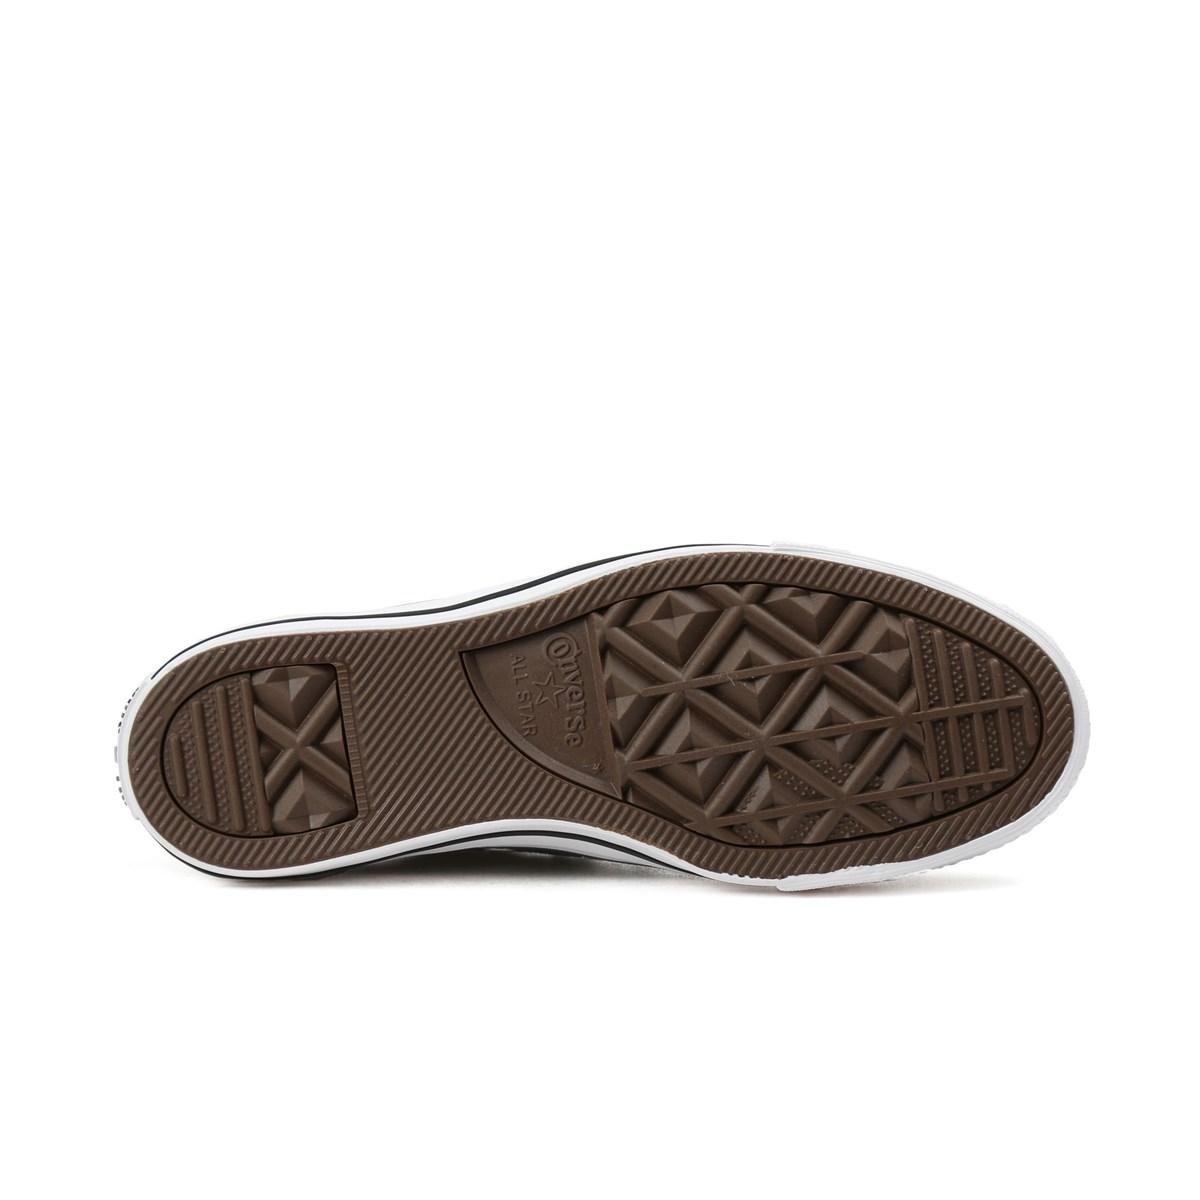 Chuck Taylor All Star Lacivert Ayakkabı